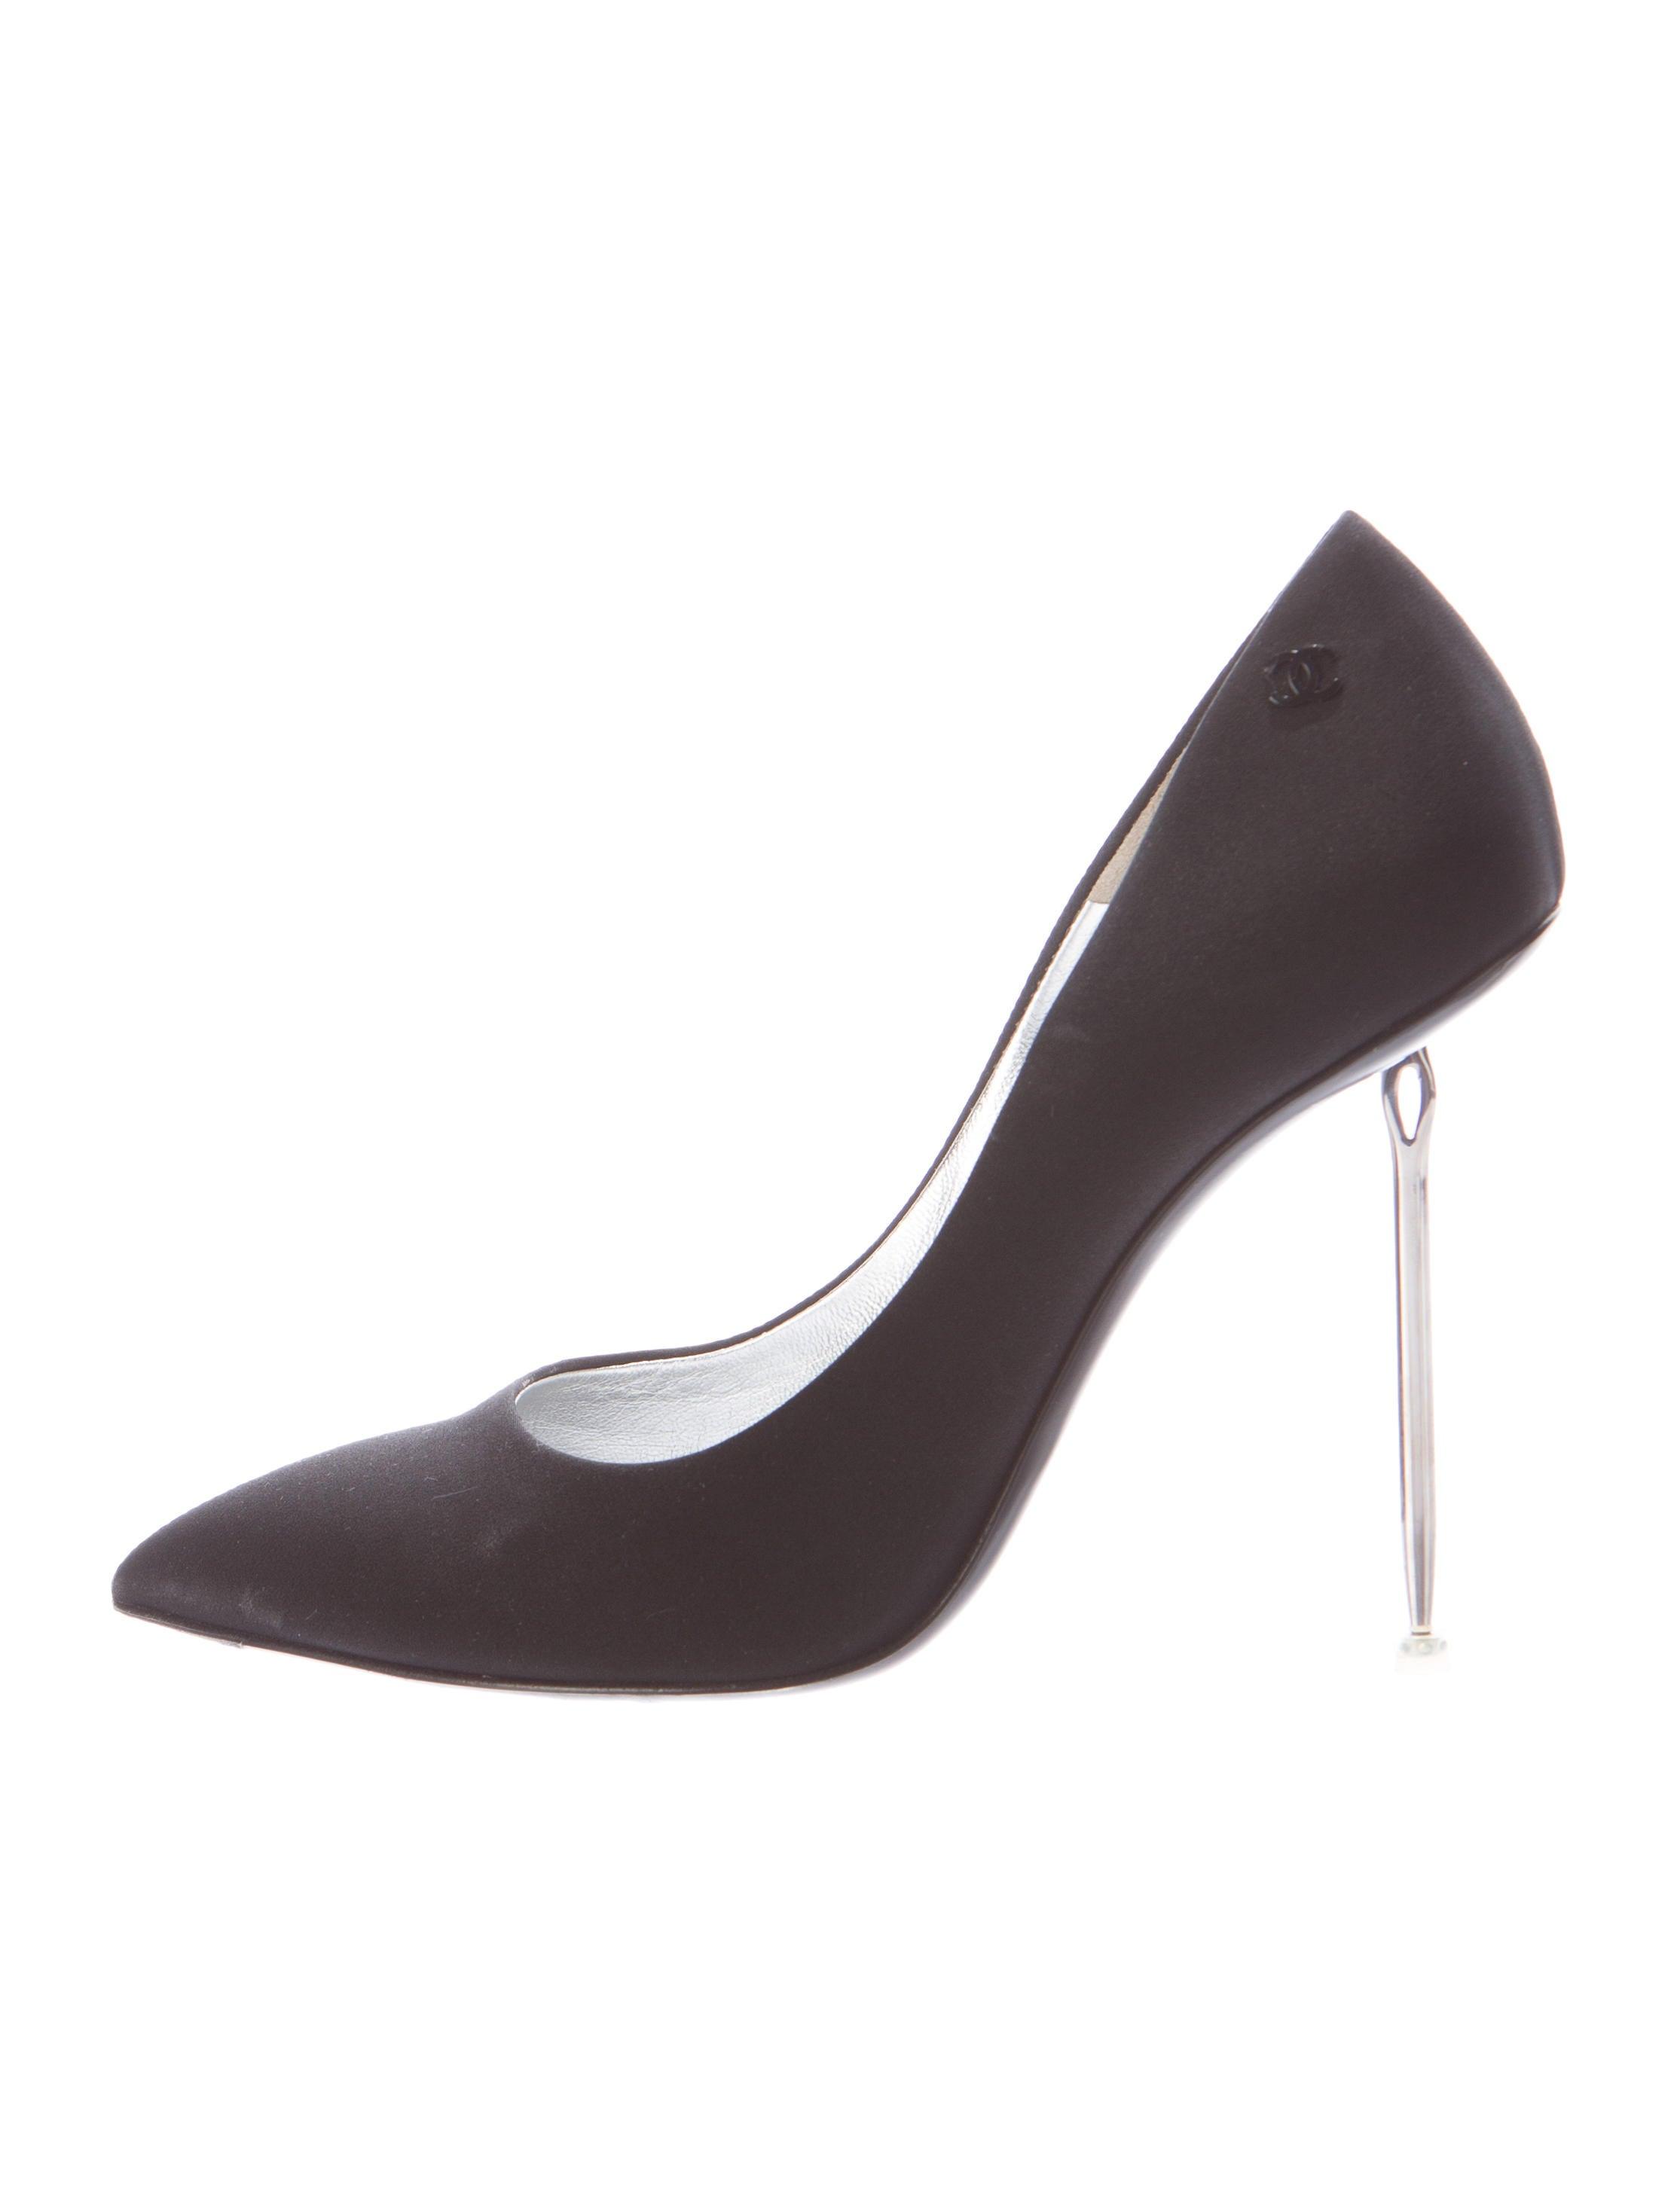 Chanel Needle Heel Satin Pumps - Shoes